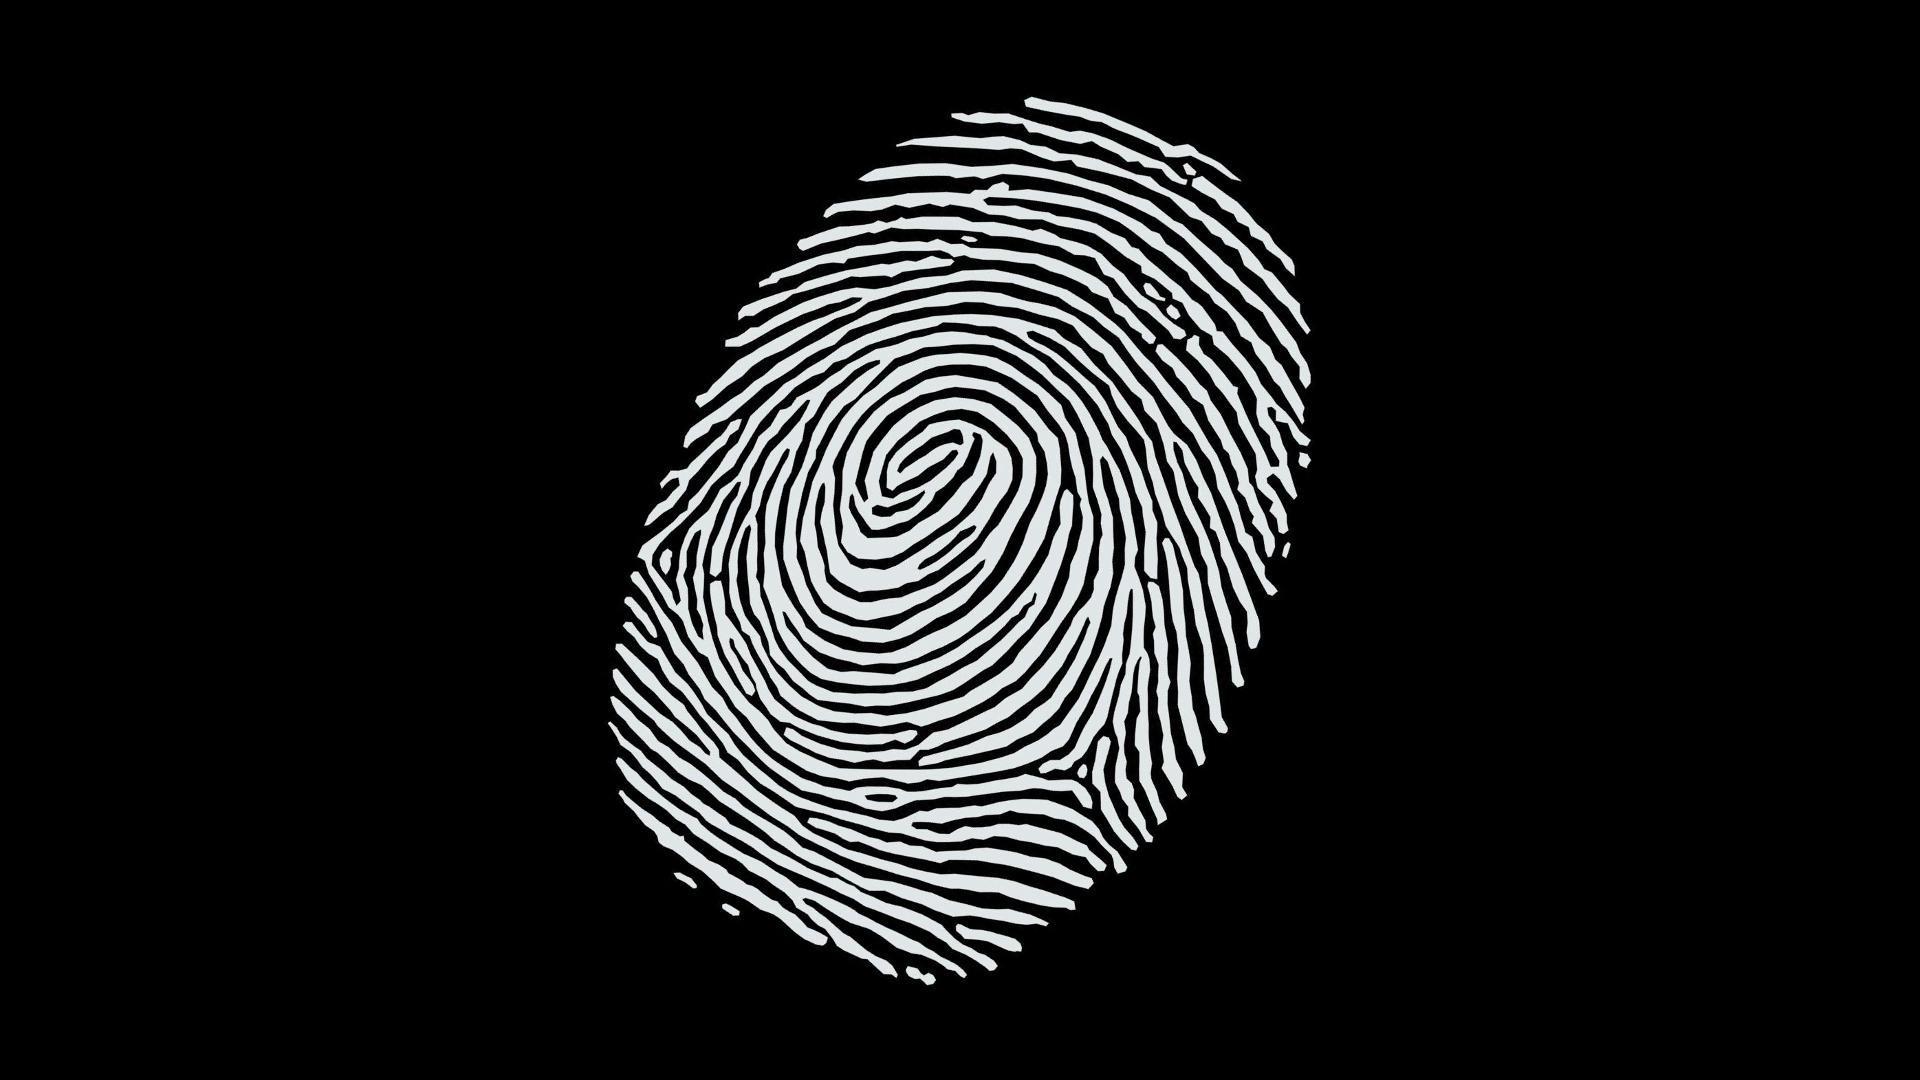 minimalism, Black Background, Black, White, Abstract, Monochrome,  Fingerprints Wallpapers HD / Desktop and Mobile Backgrounds